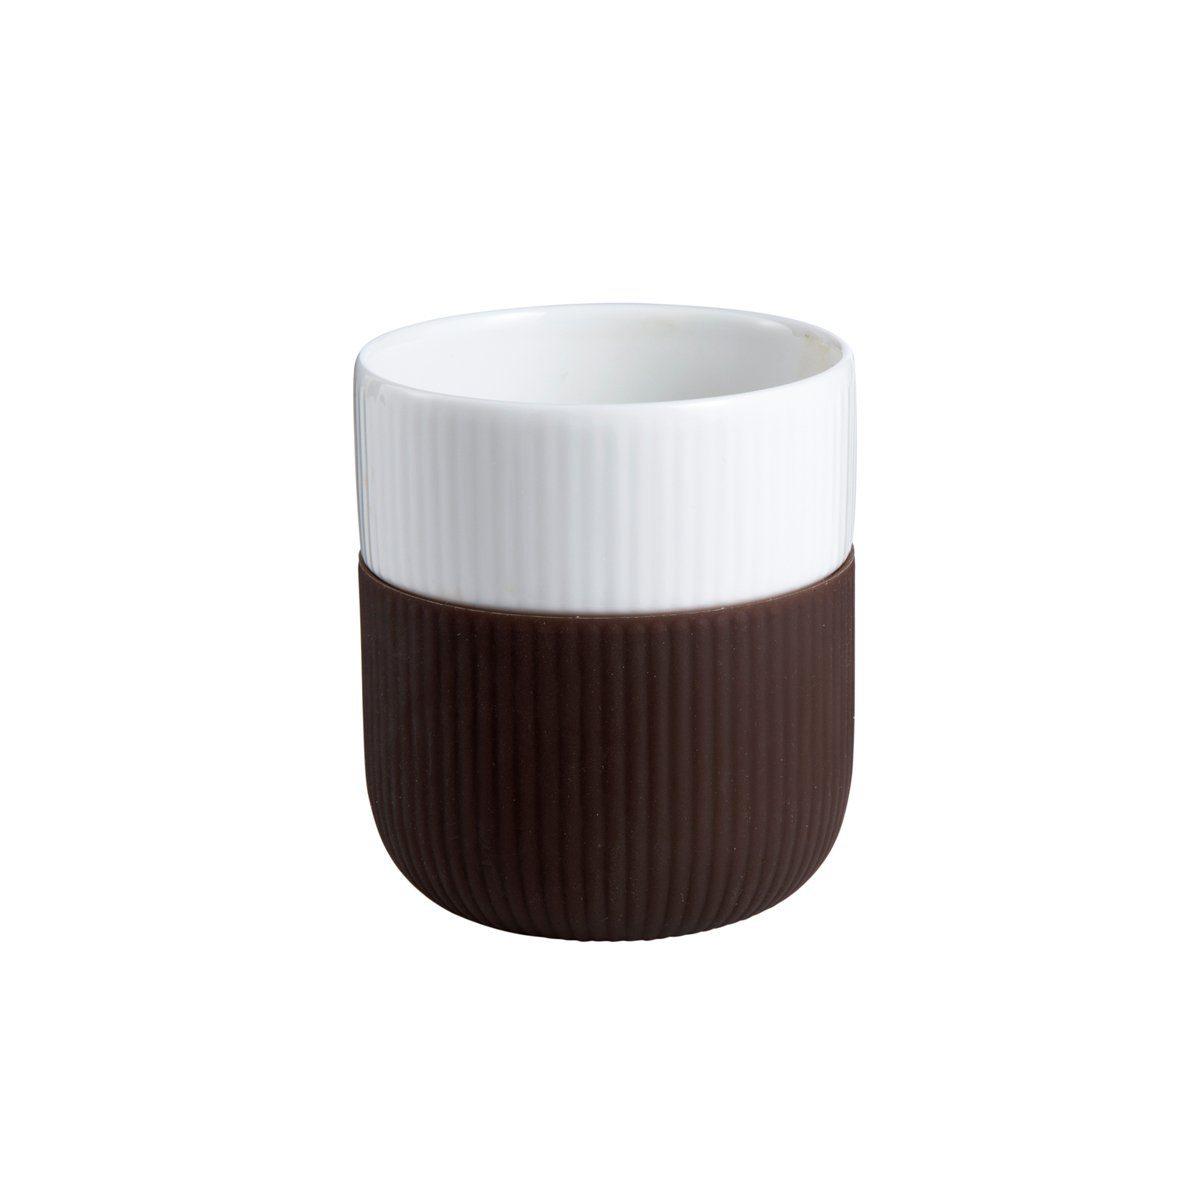 ROYAL COPENHAGEN Royal Copenhagen FUNCTION Contrast Becher 33cl schokolade